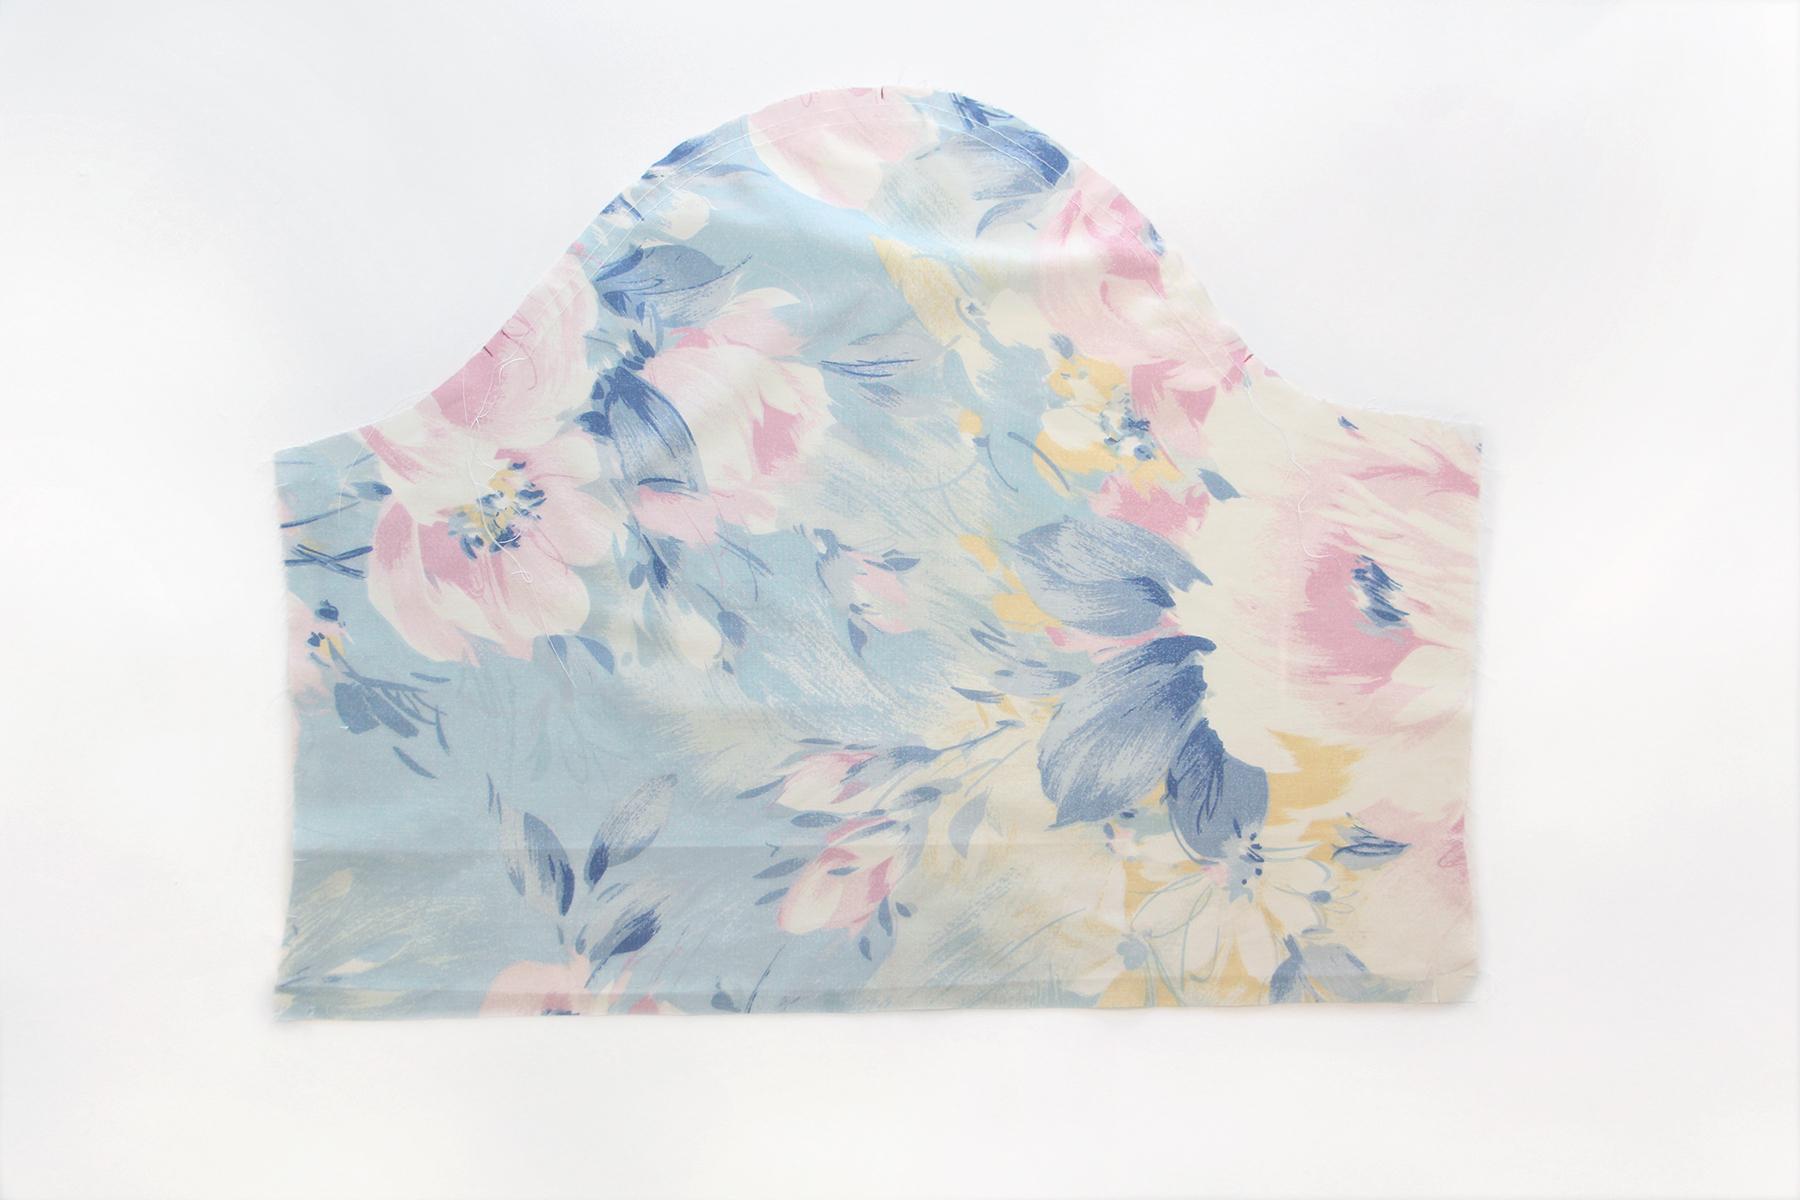 Megan Nielsen Patterns | Matilda Sewalong: Sleeves - Sewing Your Sleeve Head Easing Stitches